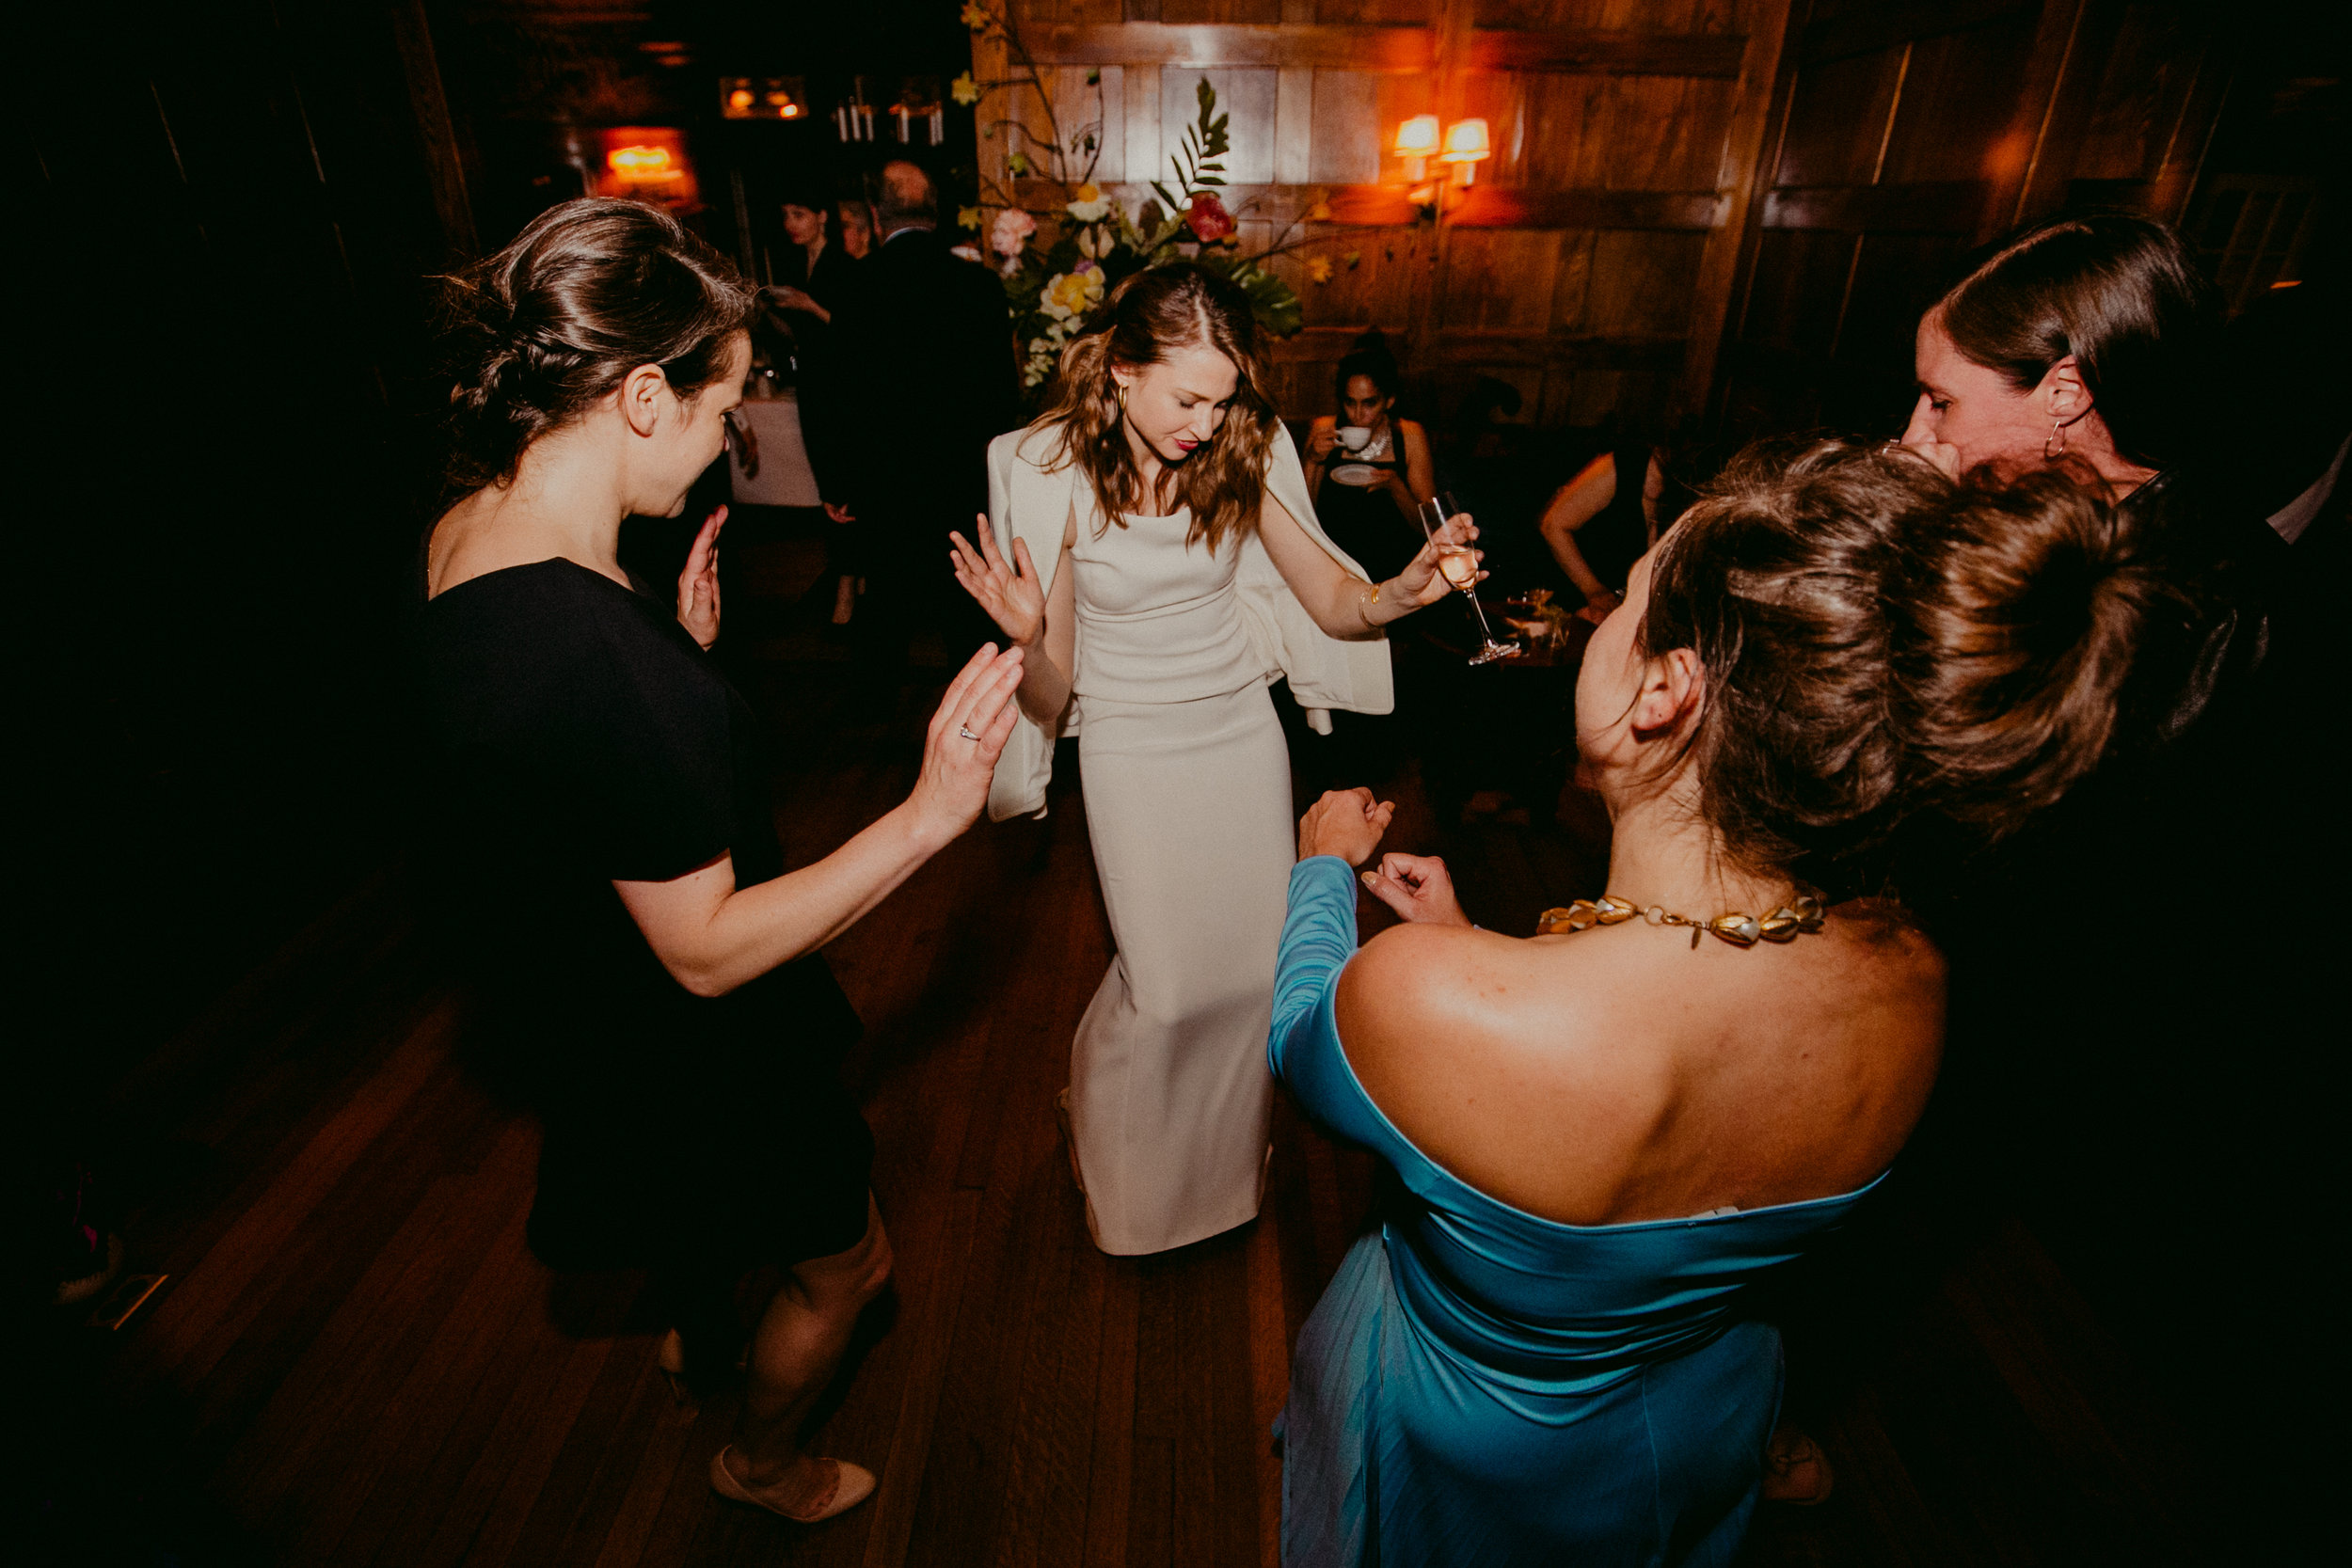 Tiger_House_The_Inn_at_Hudson-Wedding_Chellise_Michael_Photography-535.jpg